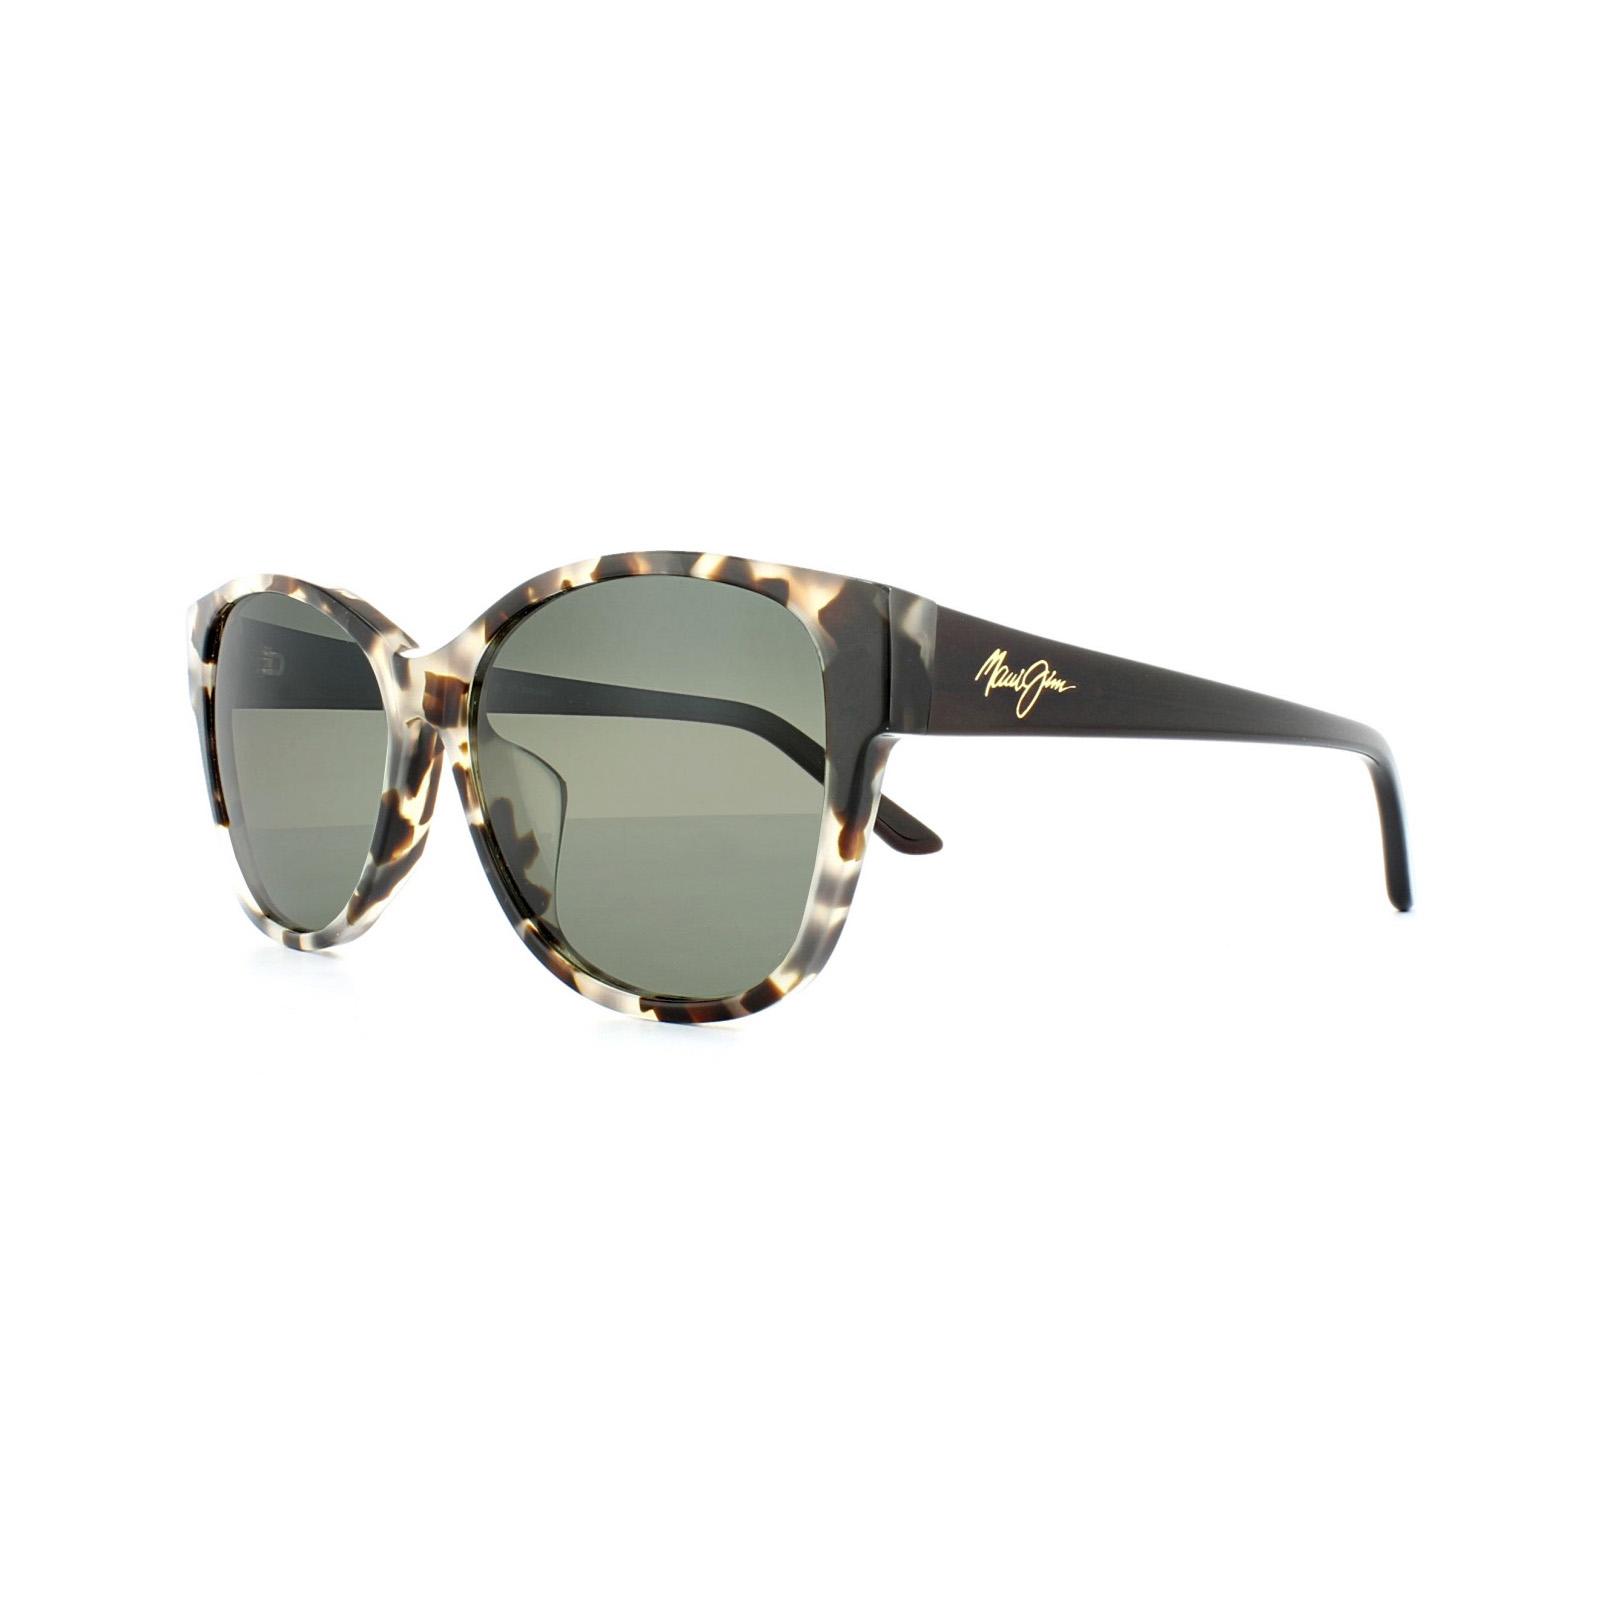 9541b6441f6 Cheap Maui Jim Summer Time Sunglasses - Discounted Sunglasses